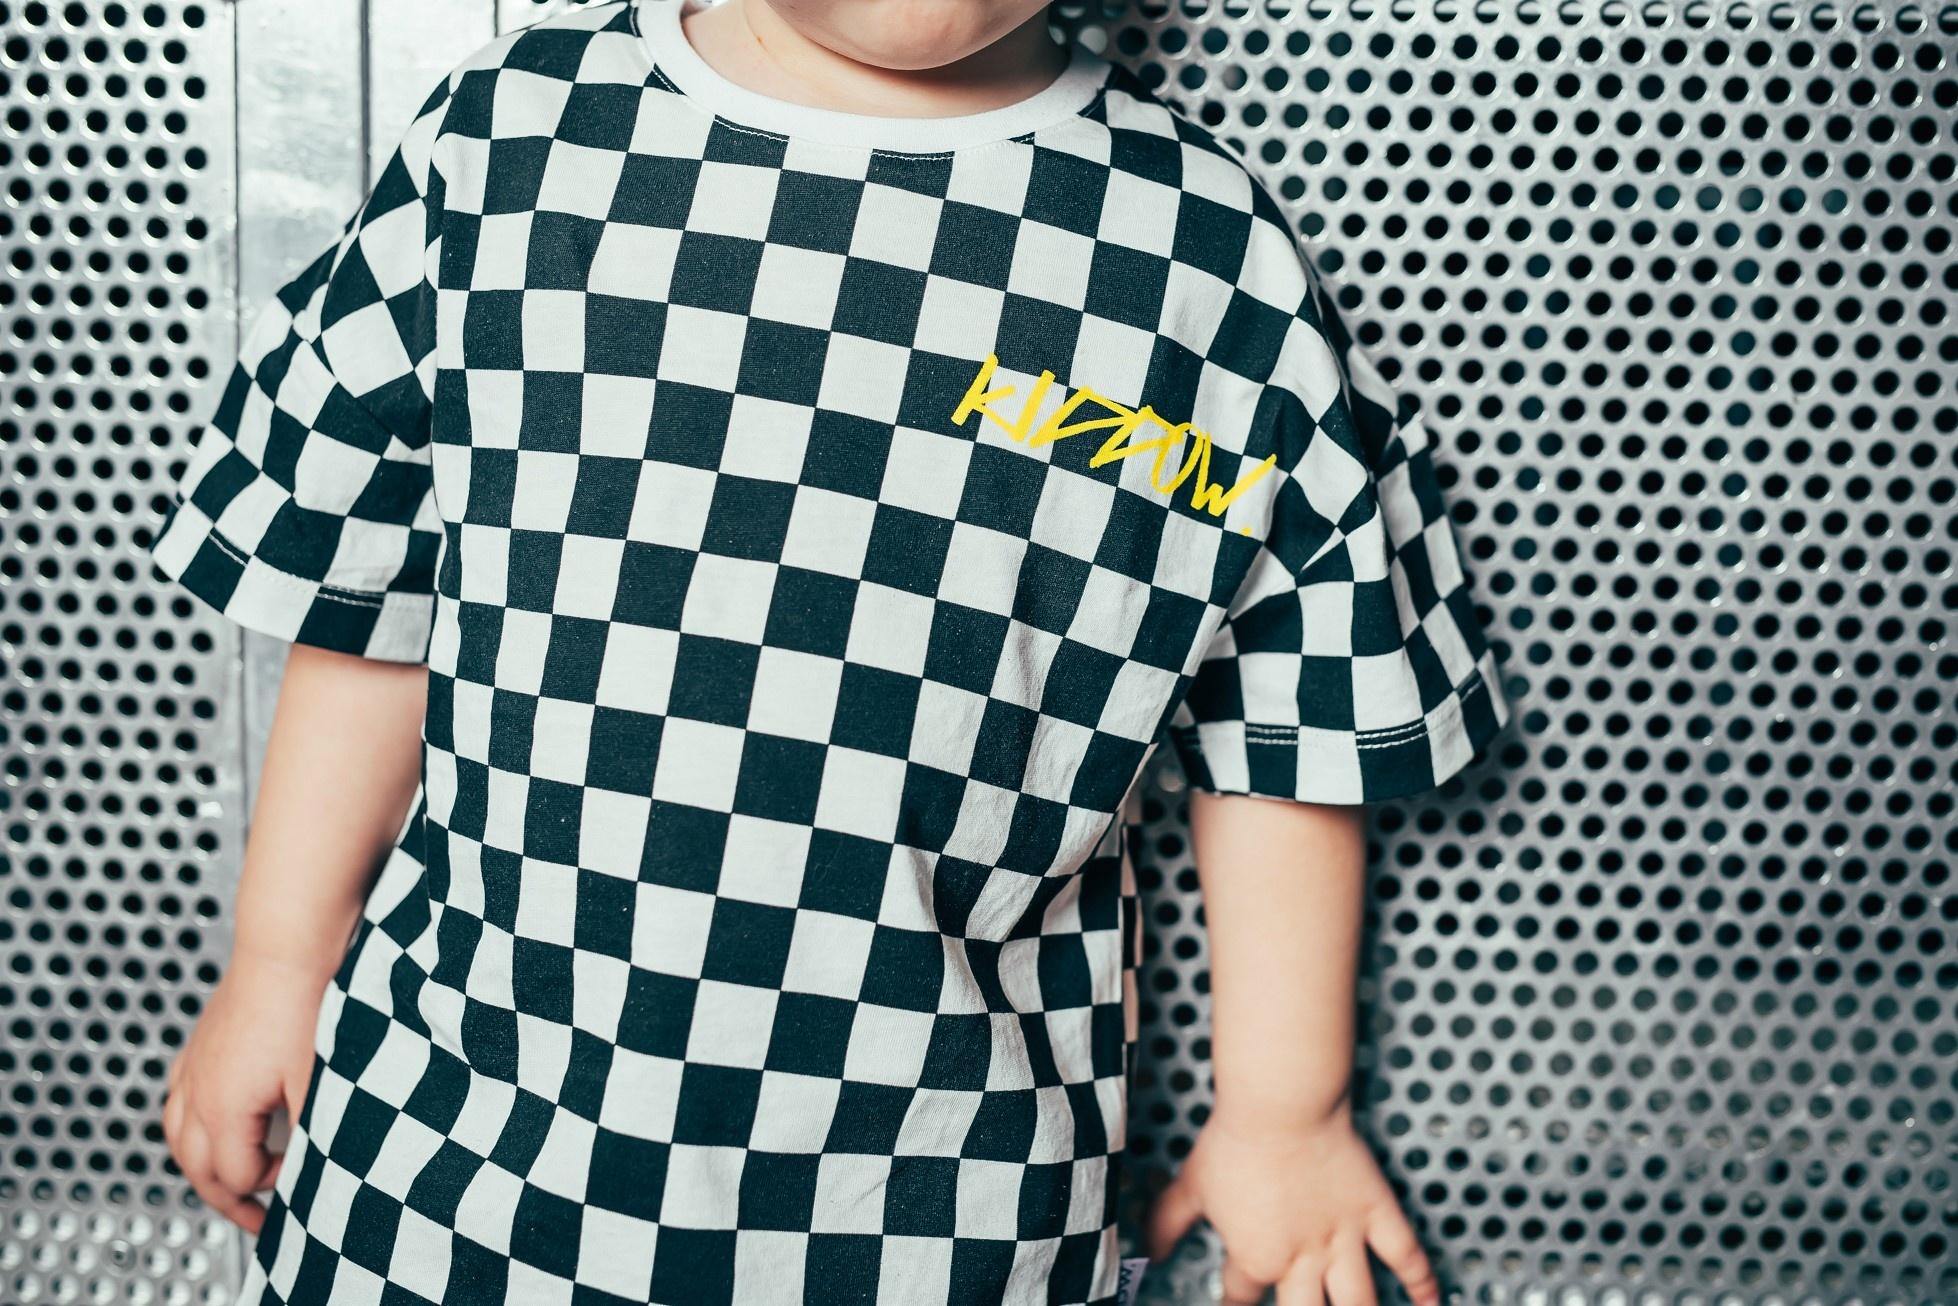 Kiddow OVERSIZED CHECKERED T-SHIRT | COOL SHIRT FOR CHILDREN | CHILDREN'S CLOTHING